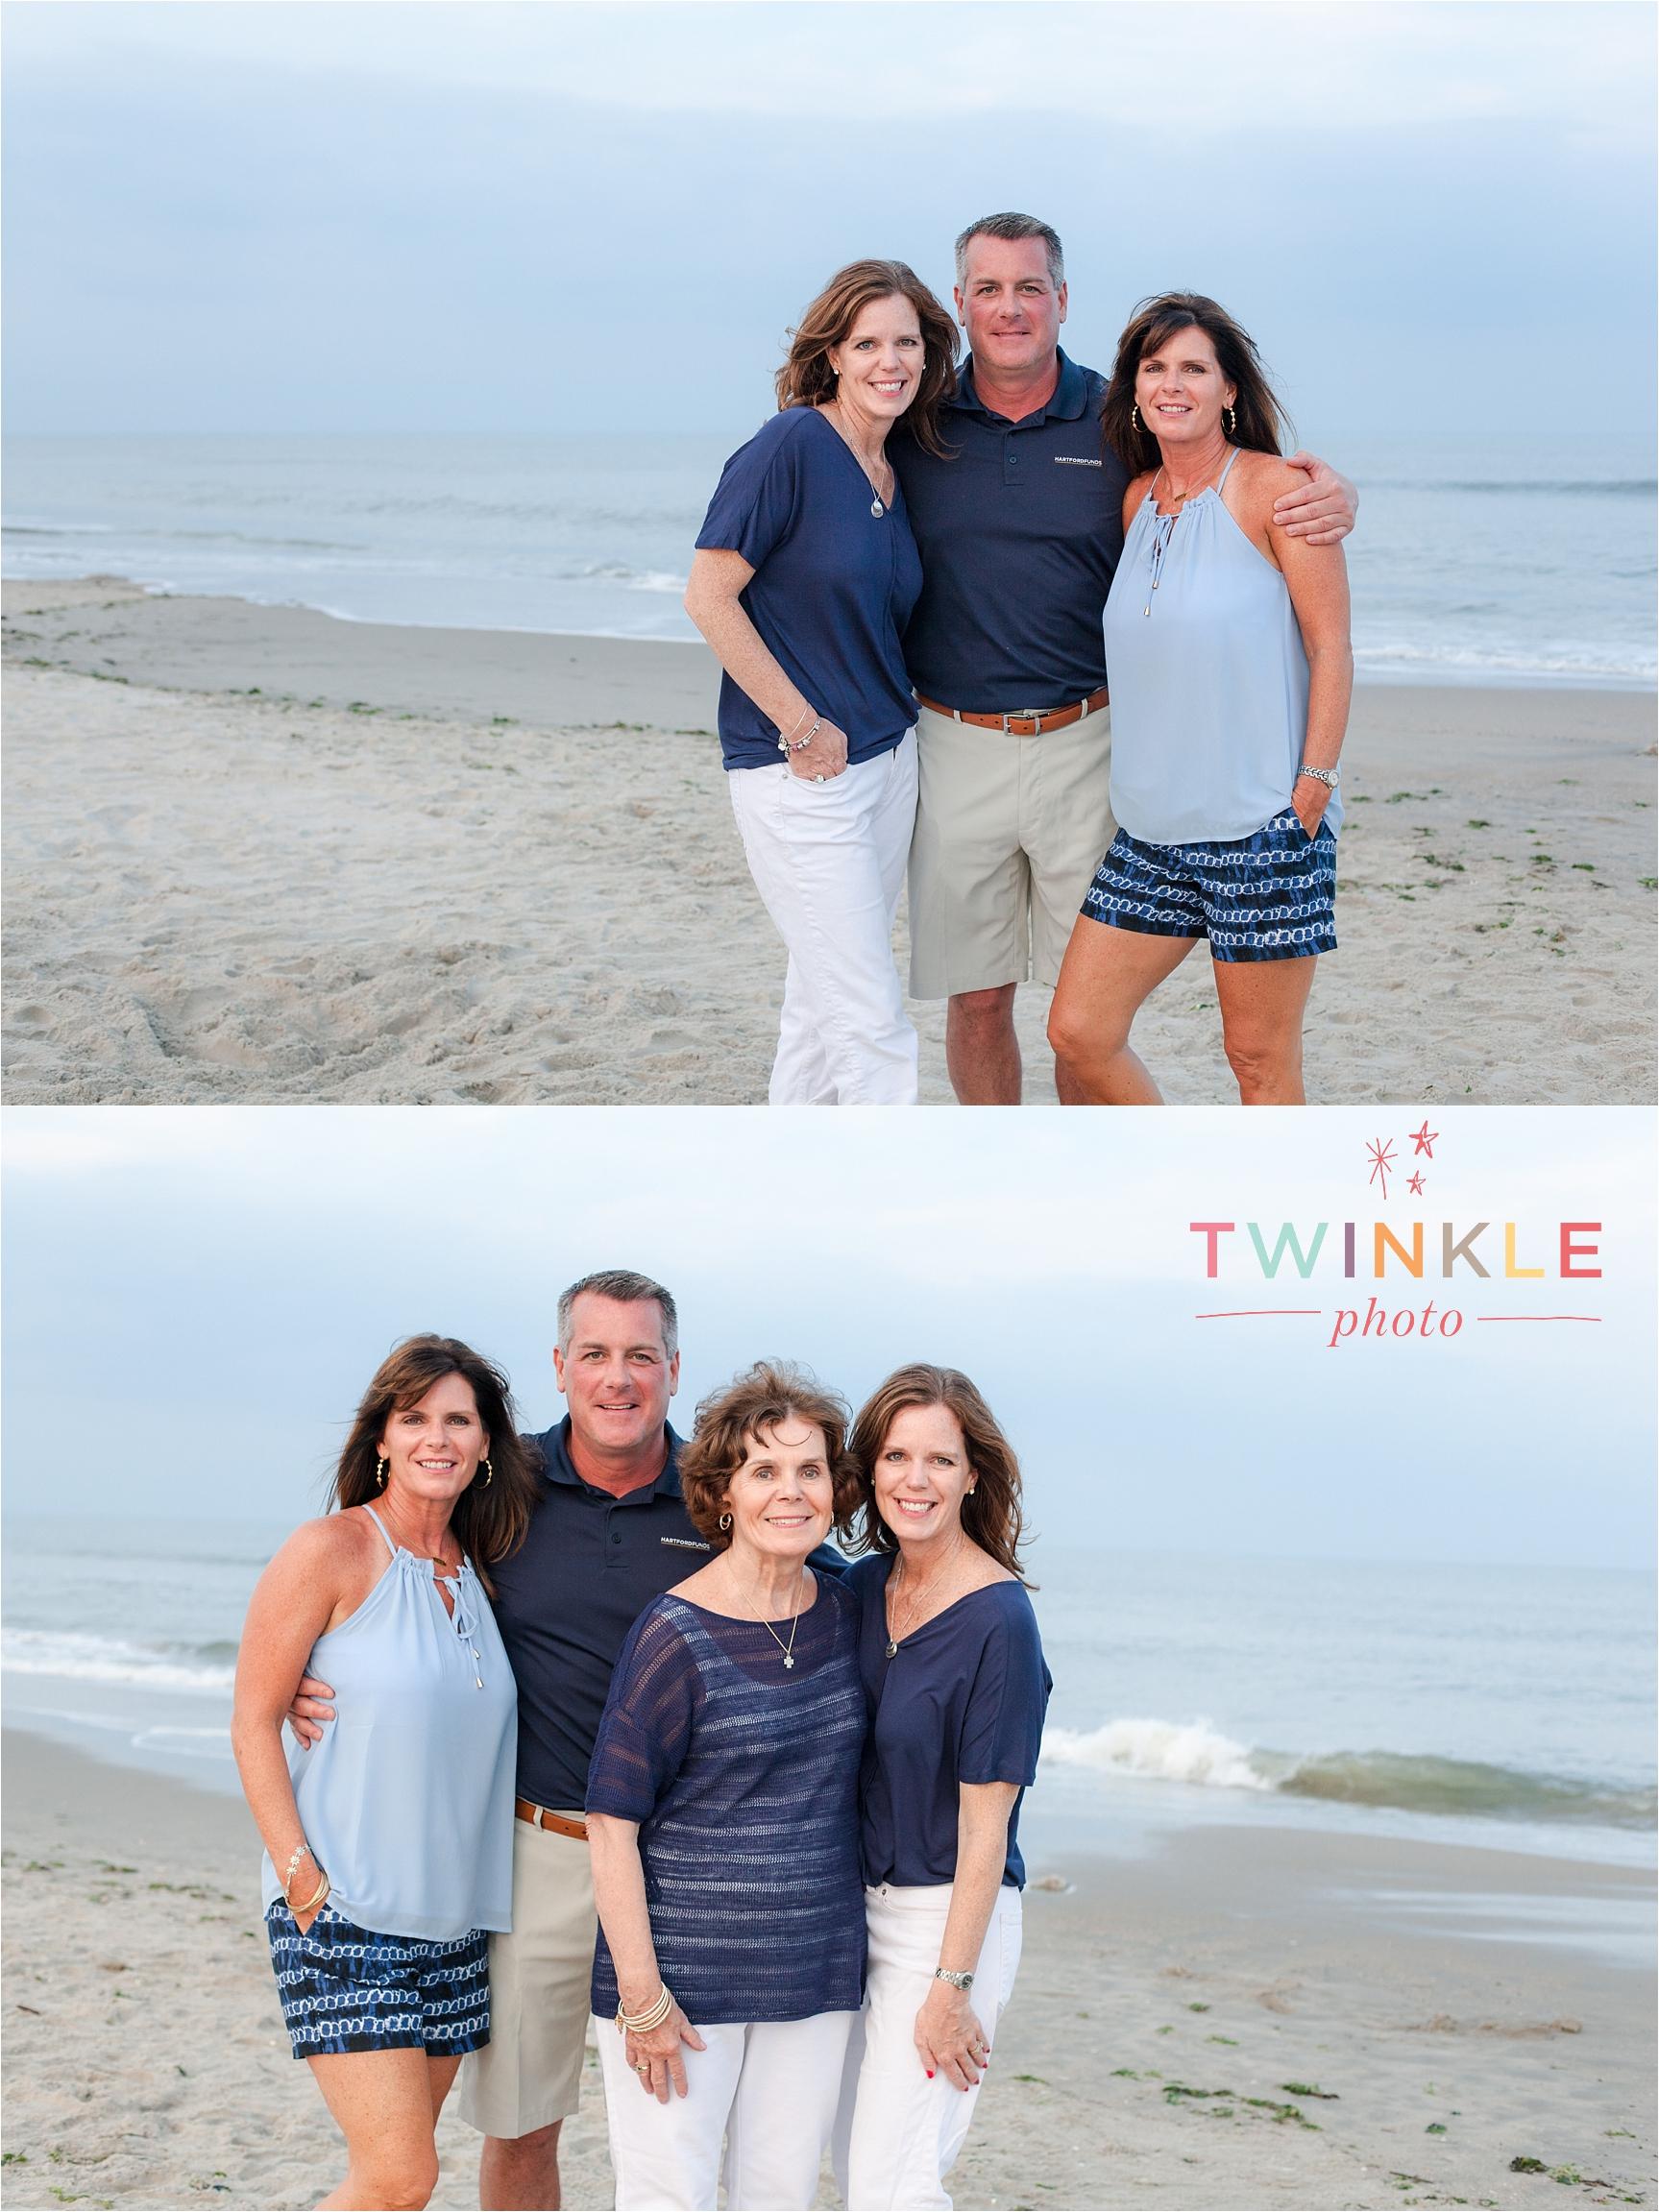 OCNJ Ocean City New Jersey Beach Photography 13